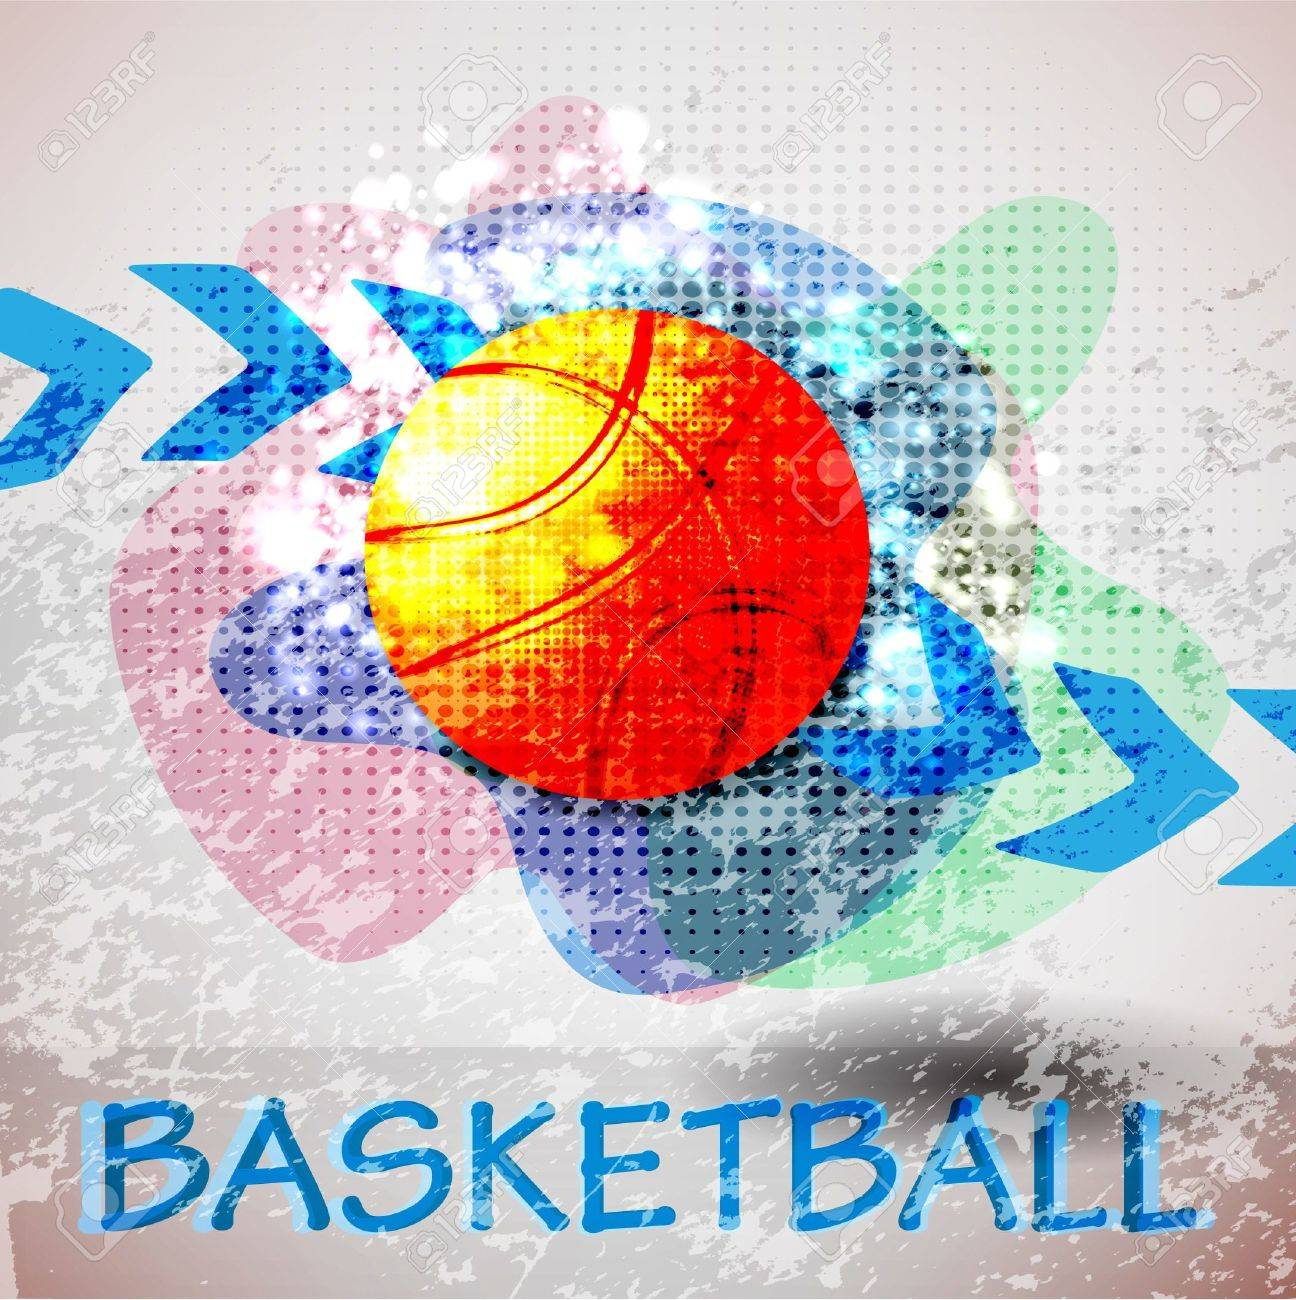 basketball advertising poster. Stock Vector - 10776181